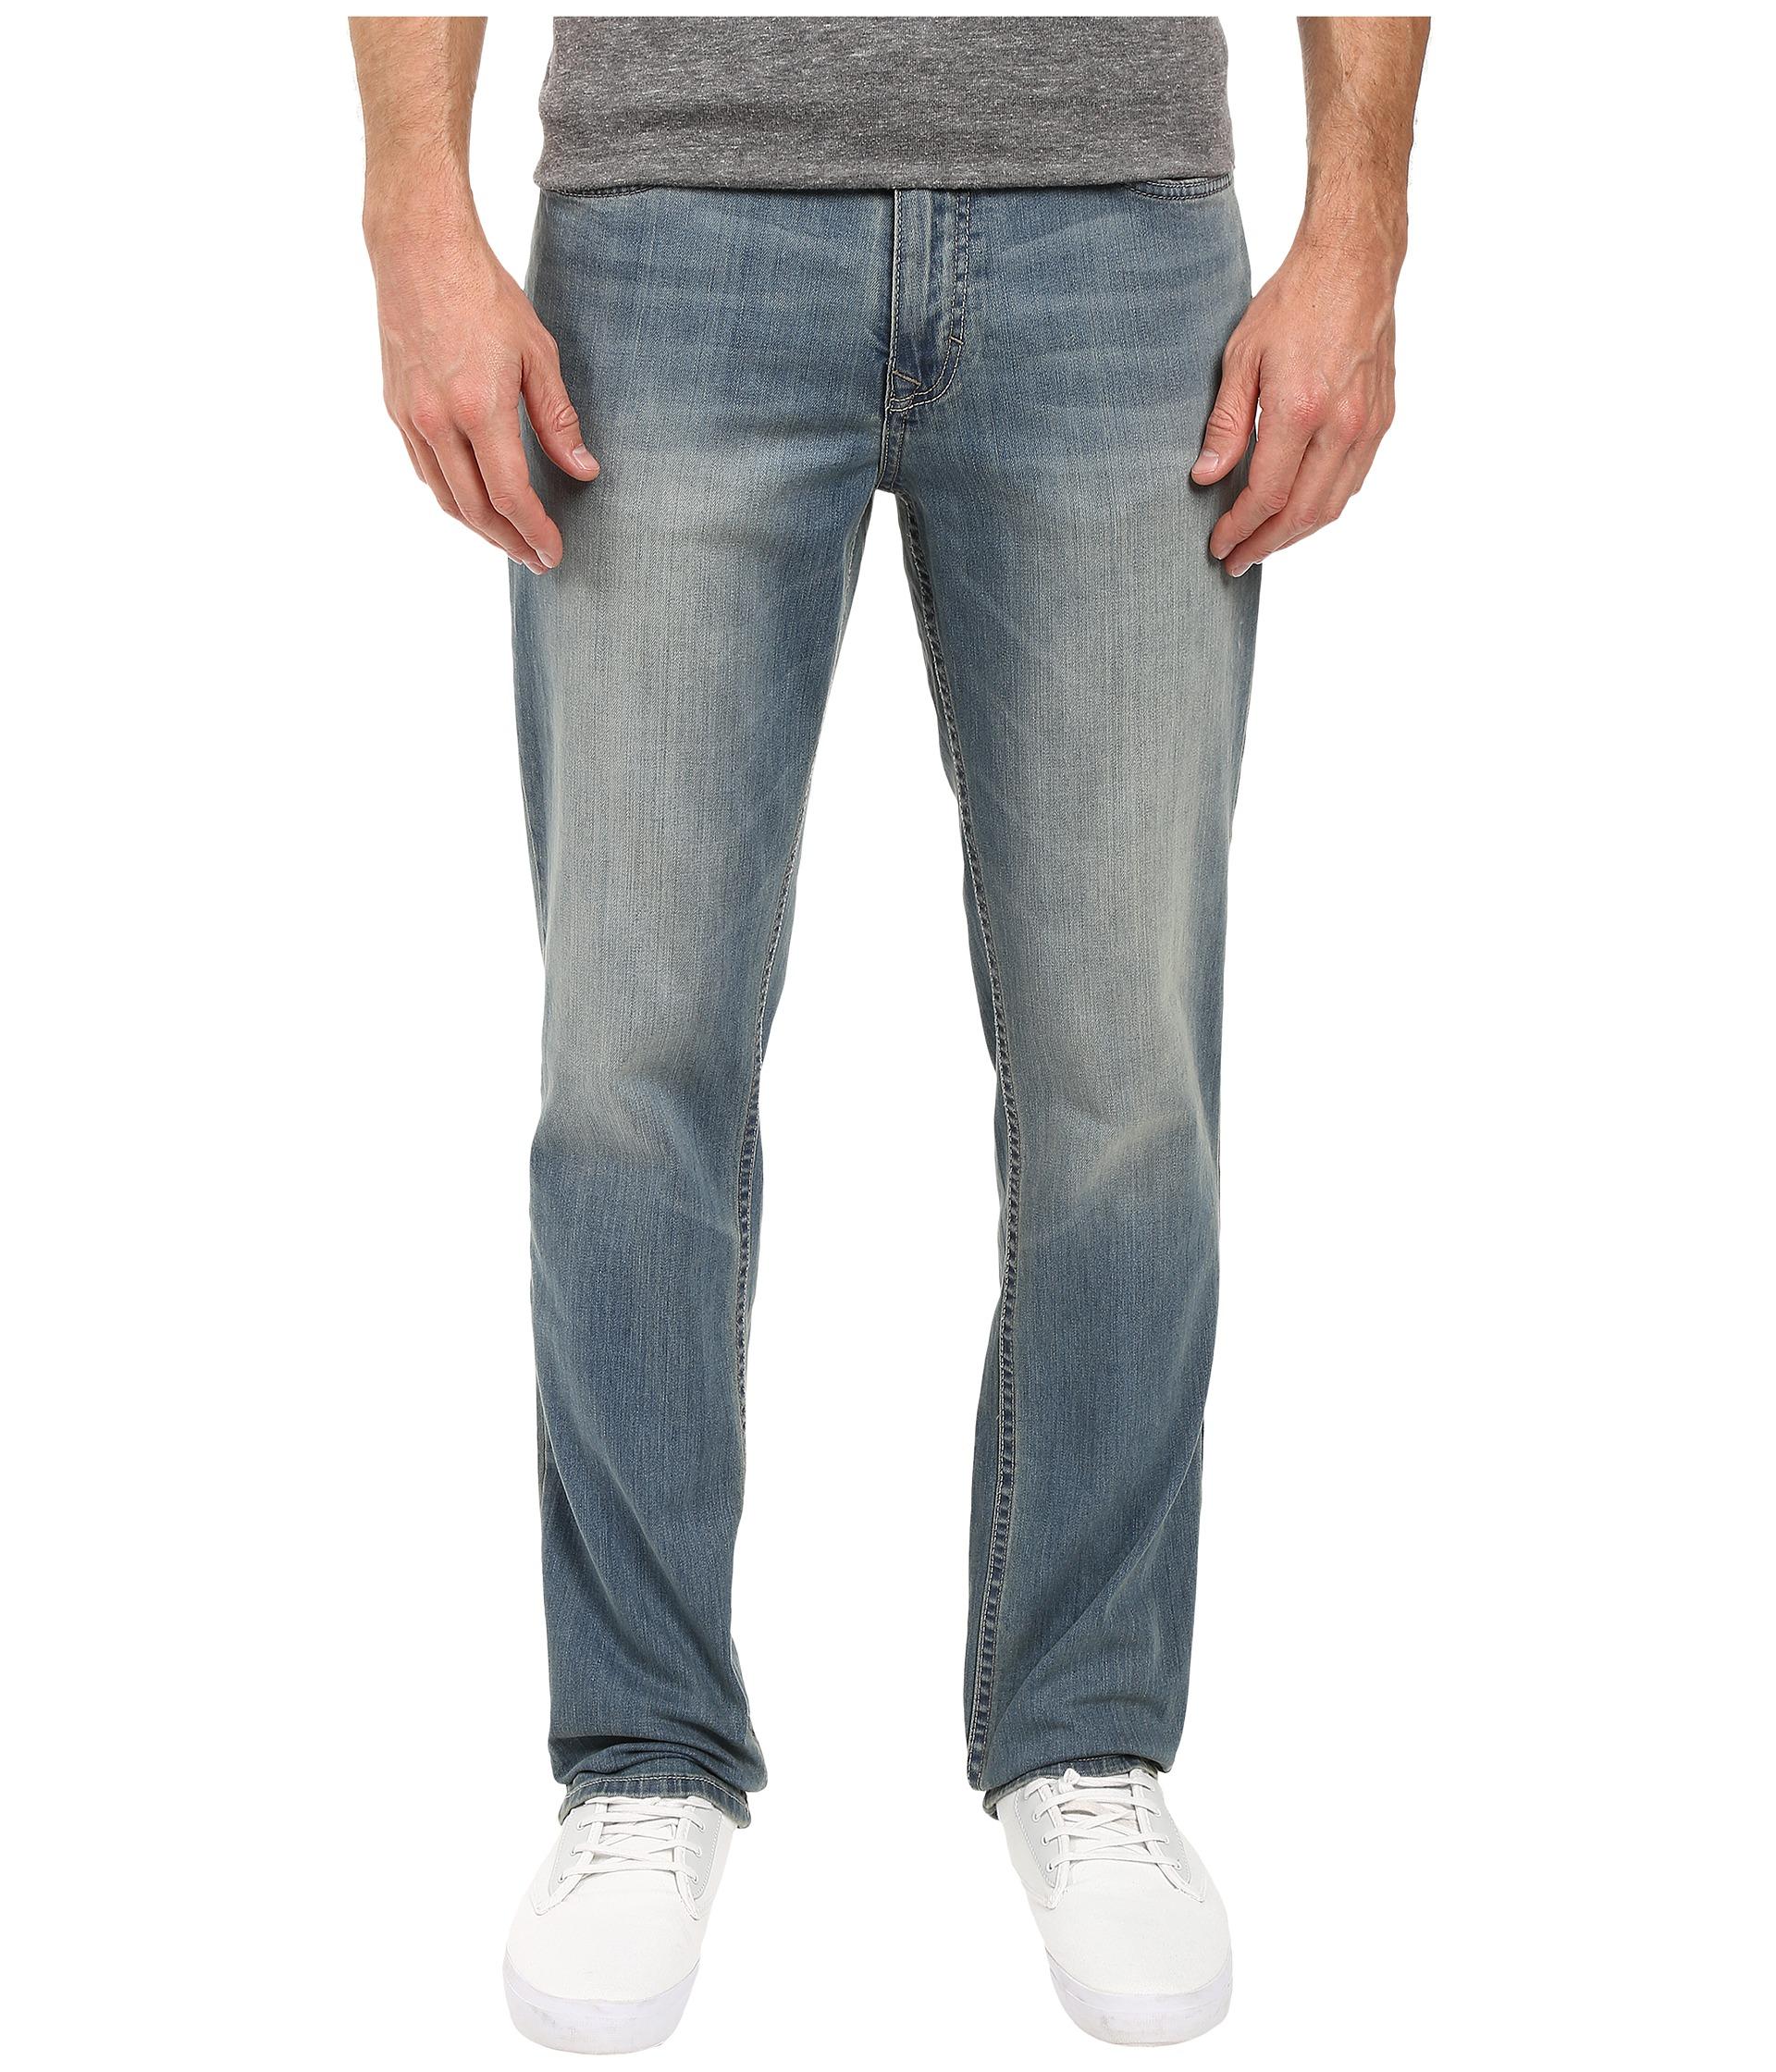 calvin klein jeans slim straight denim in silver bullet at. Black Bedroom Furniture Sets. Home Design Ideas